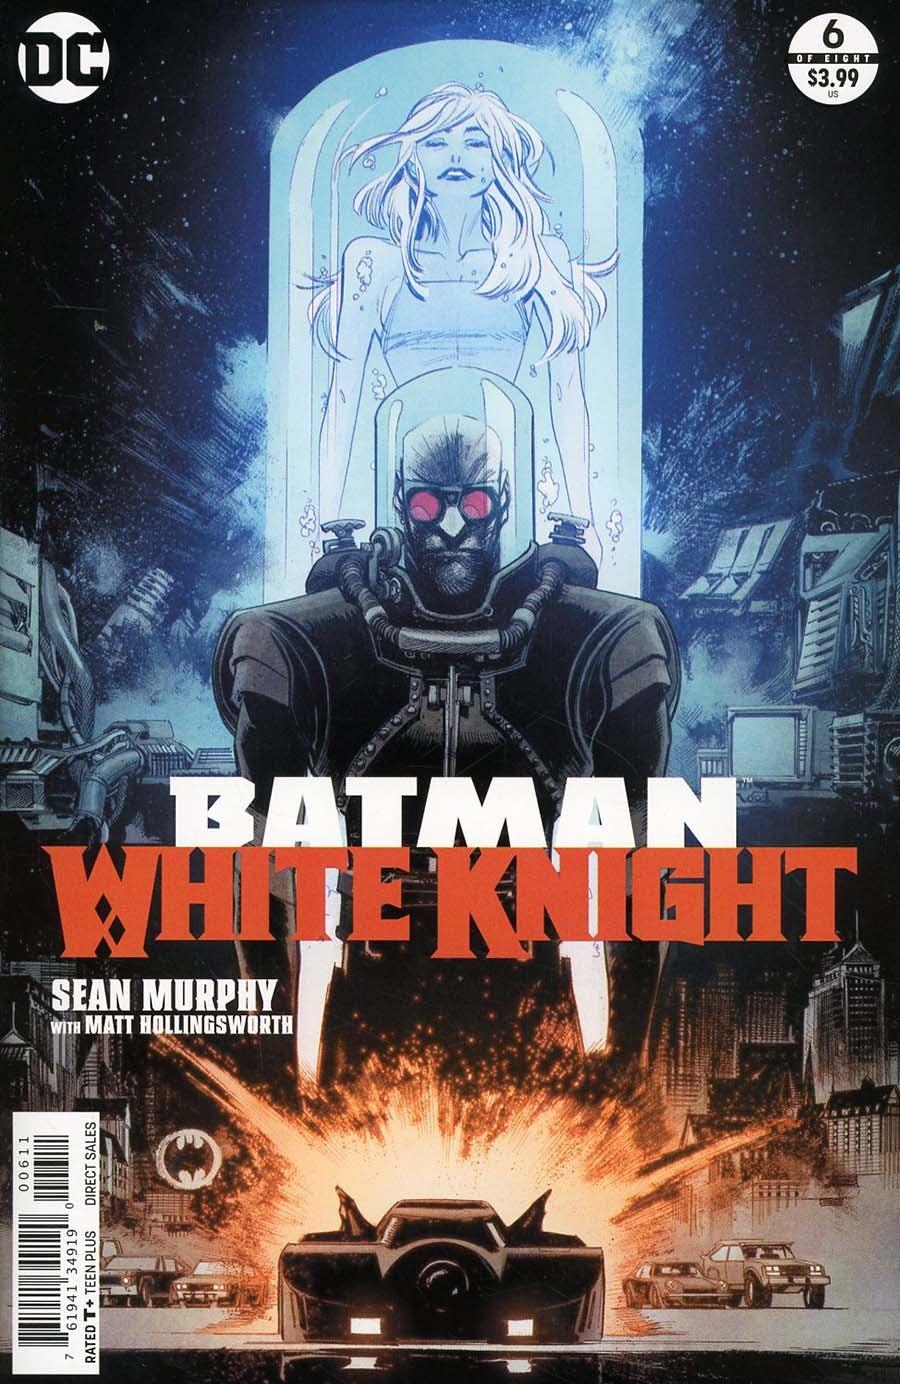 Batman: White Knight (2017) Issue 6